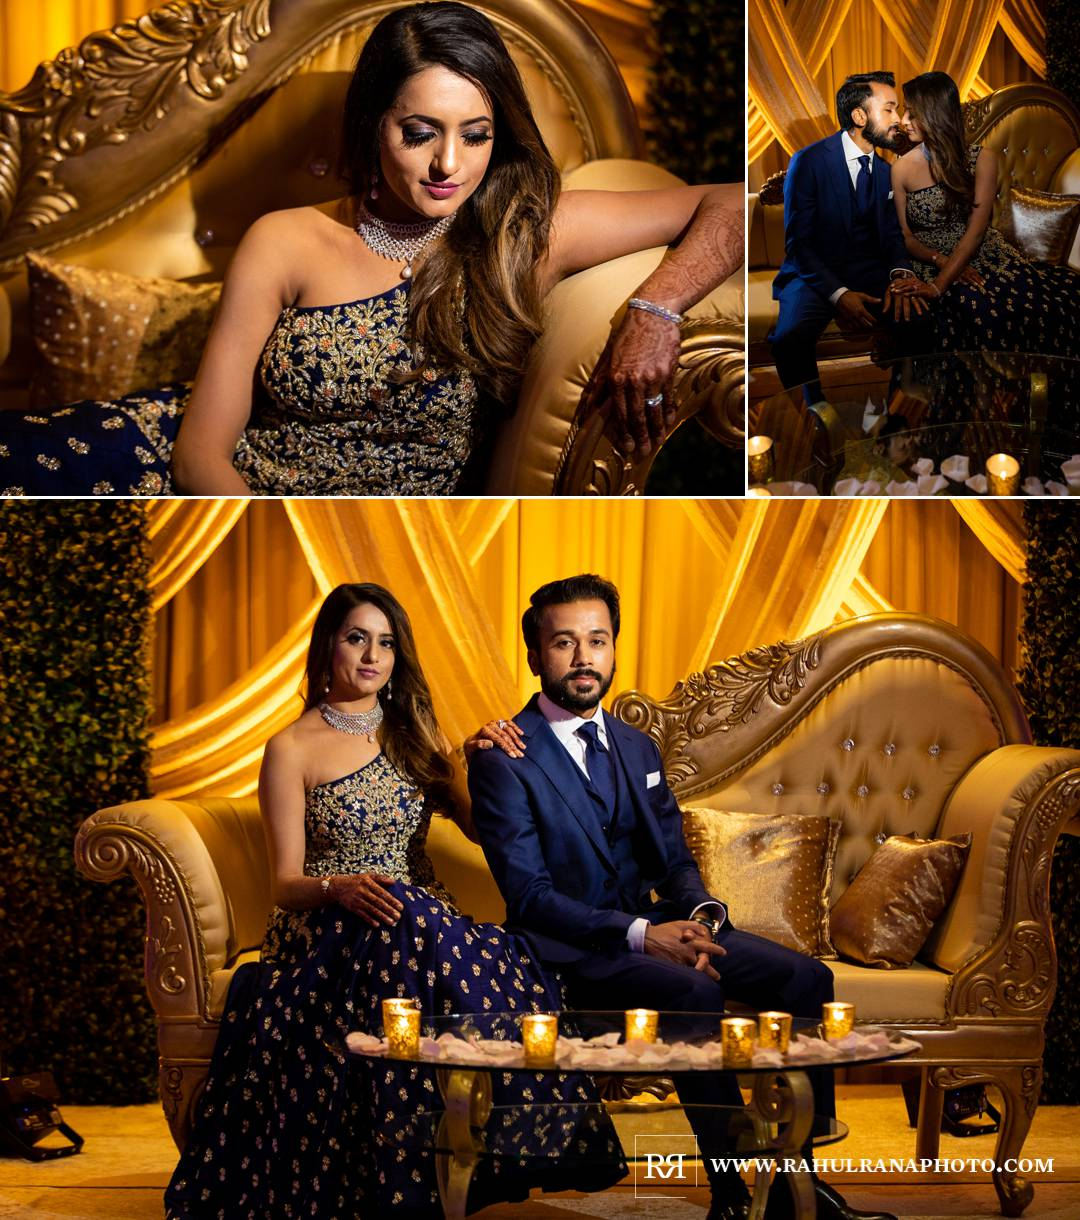 Westin North Shore - Wheeling Indian Wedding - Reception Portraits - Rahul Rana Photo